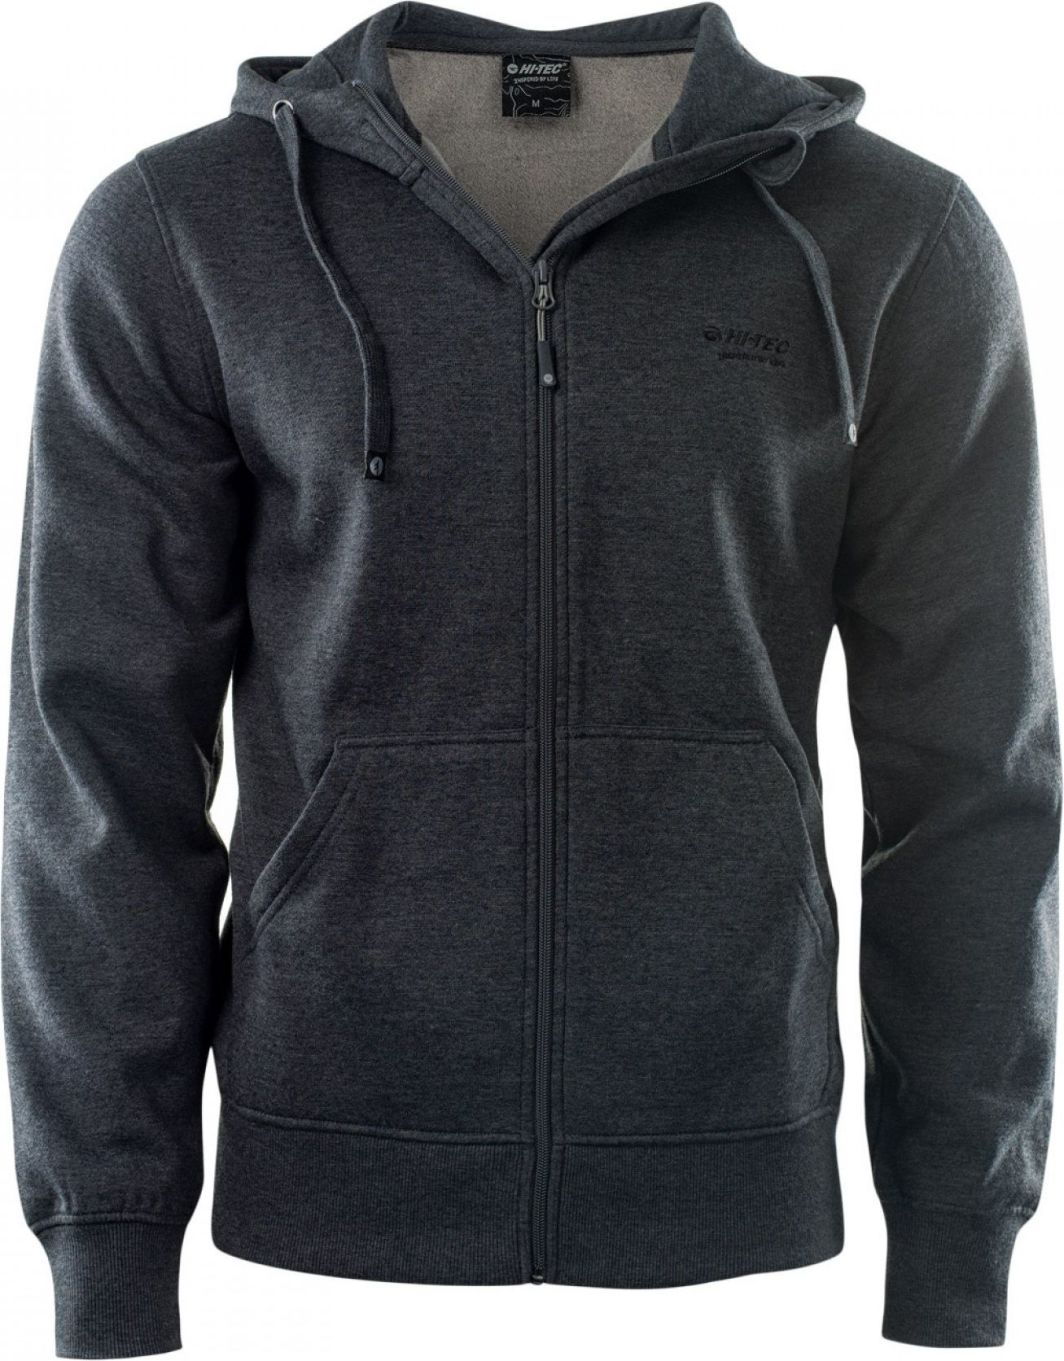 Hi tec Bluza męska Silian Dark Grey Melange r. XXL ID produktu: 1593703